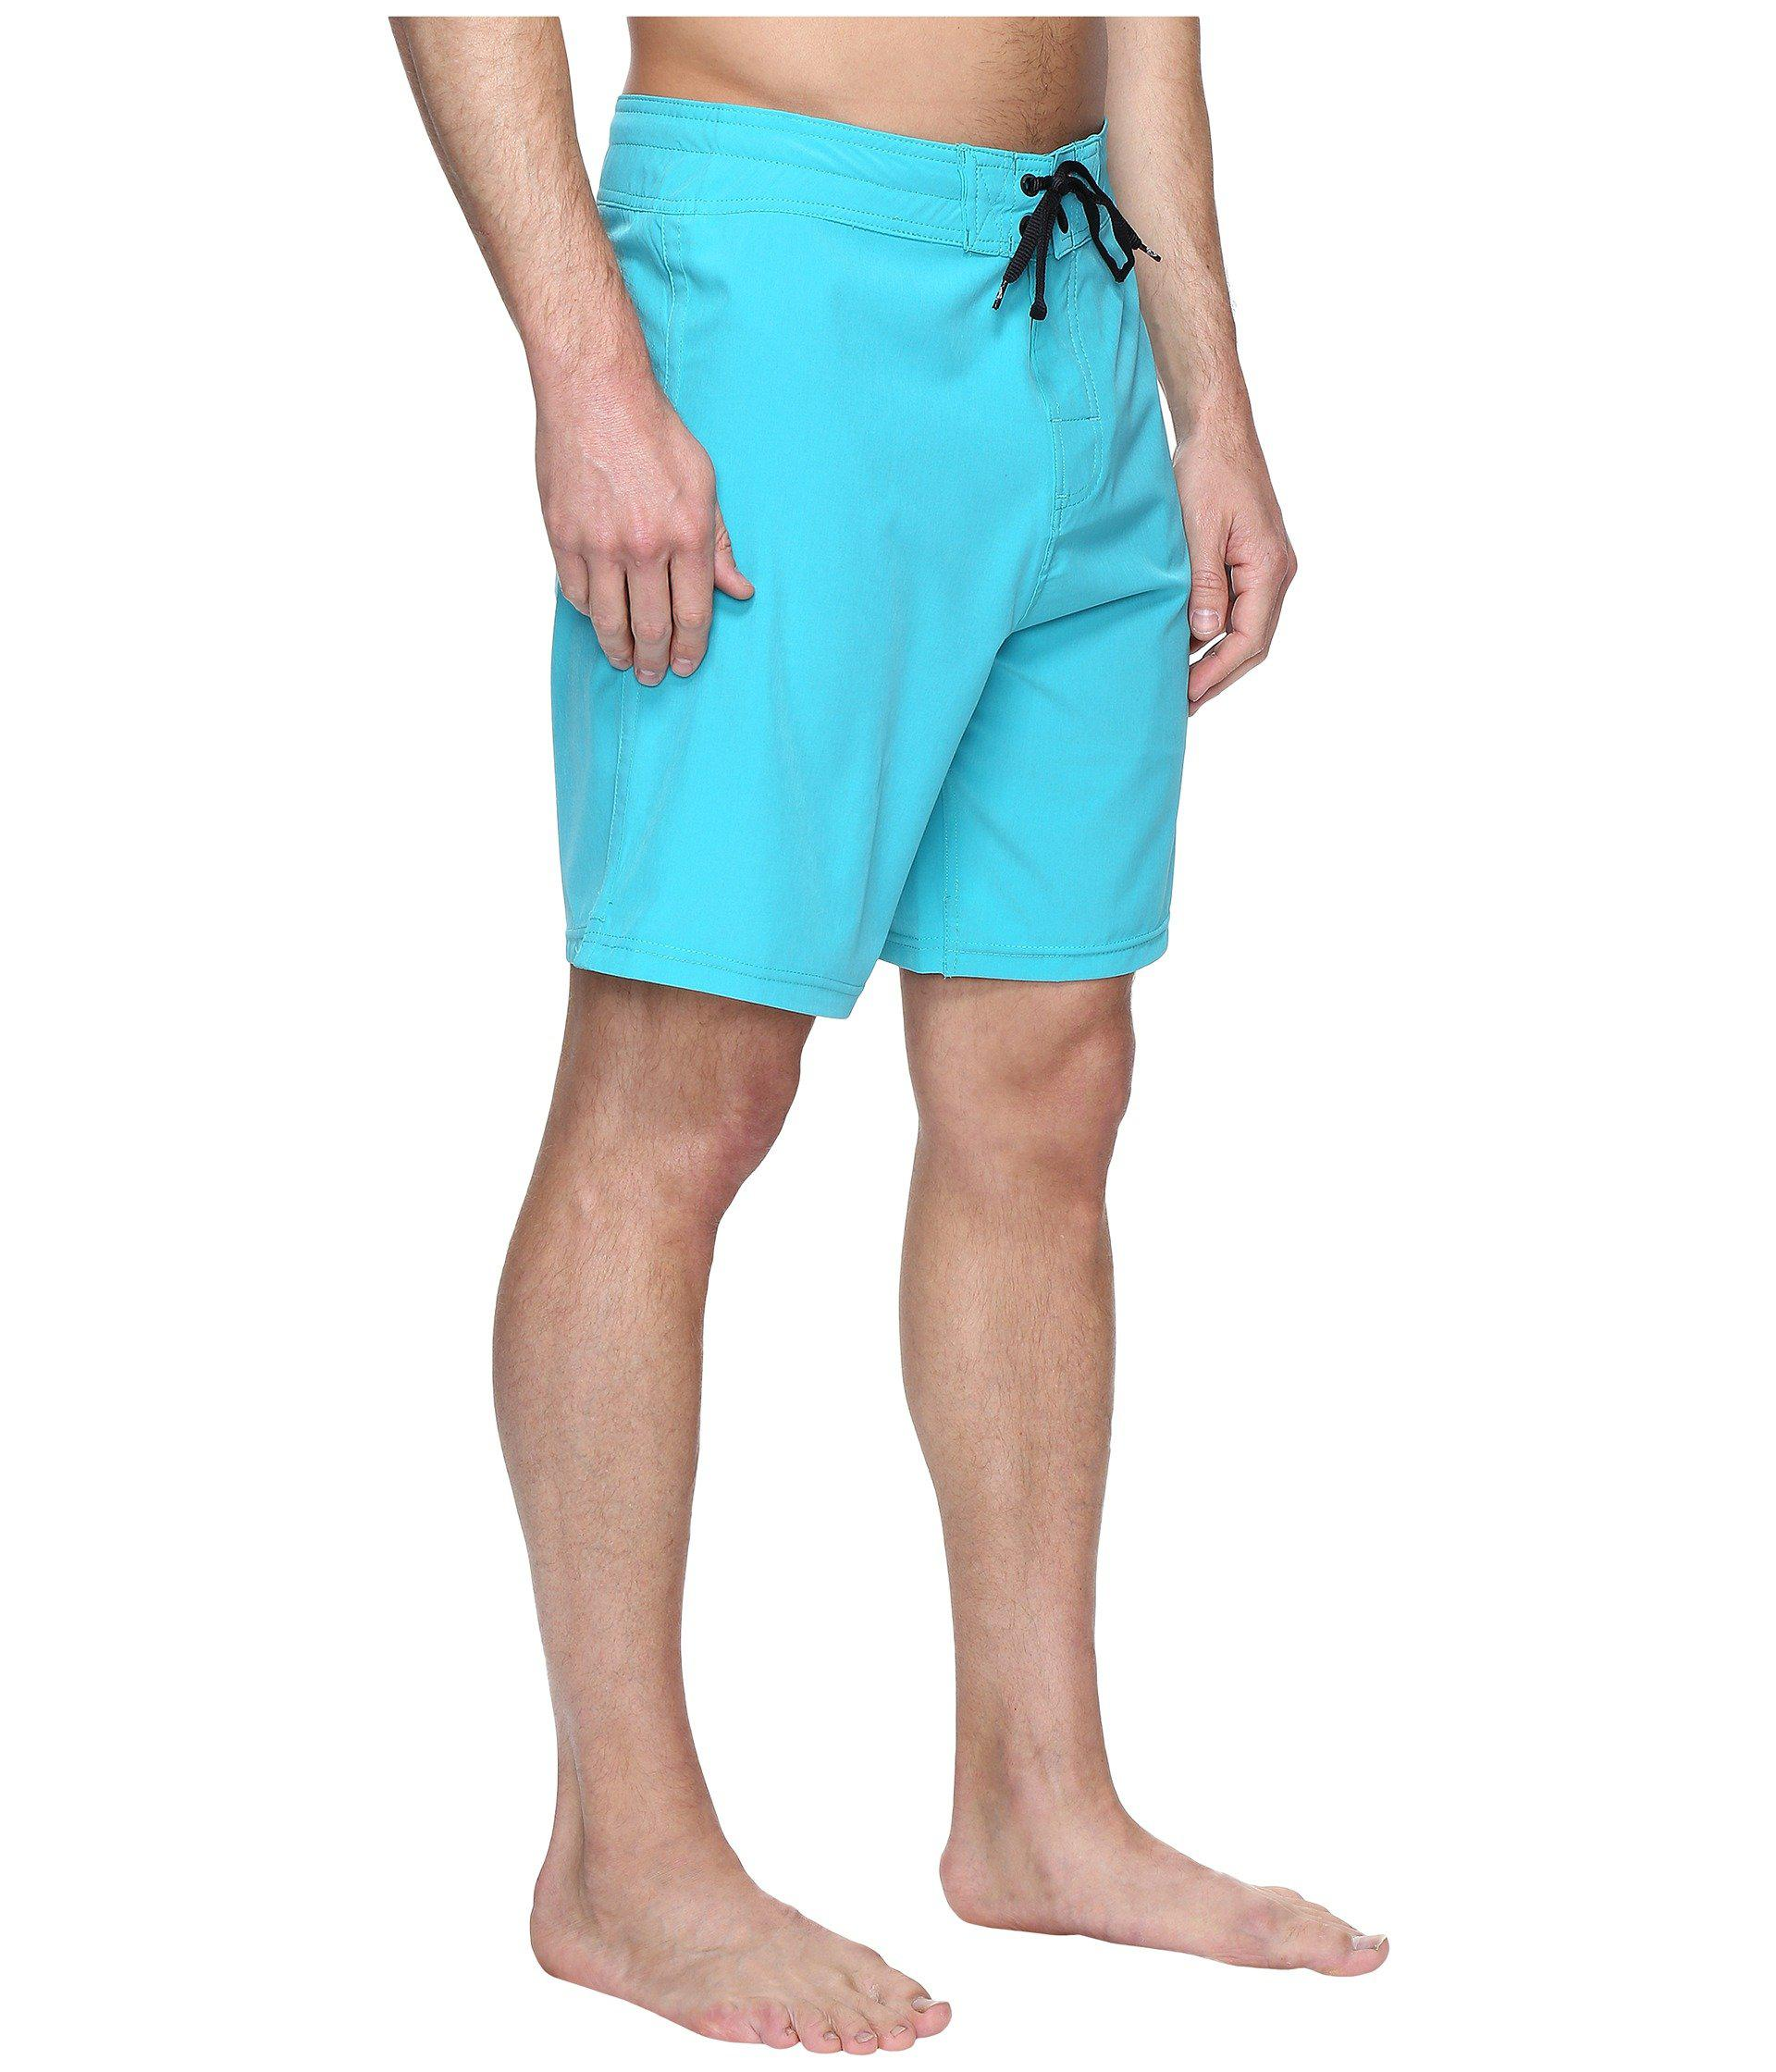 850c0c6fc1f5e Body Glove - Blue Vapor Twin Spin Boardshorts for Men - Lyst. View  fullscreen